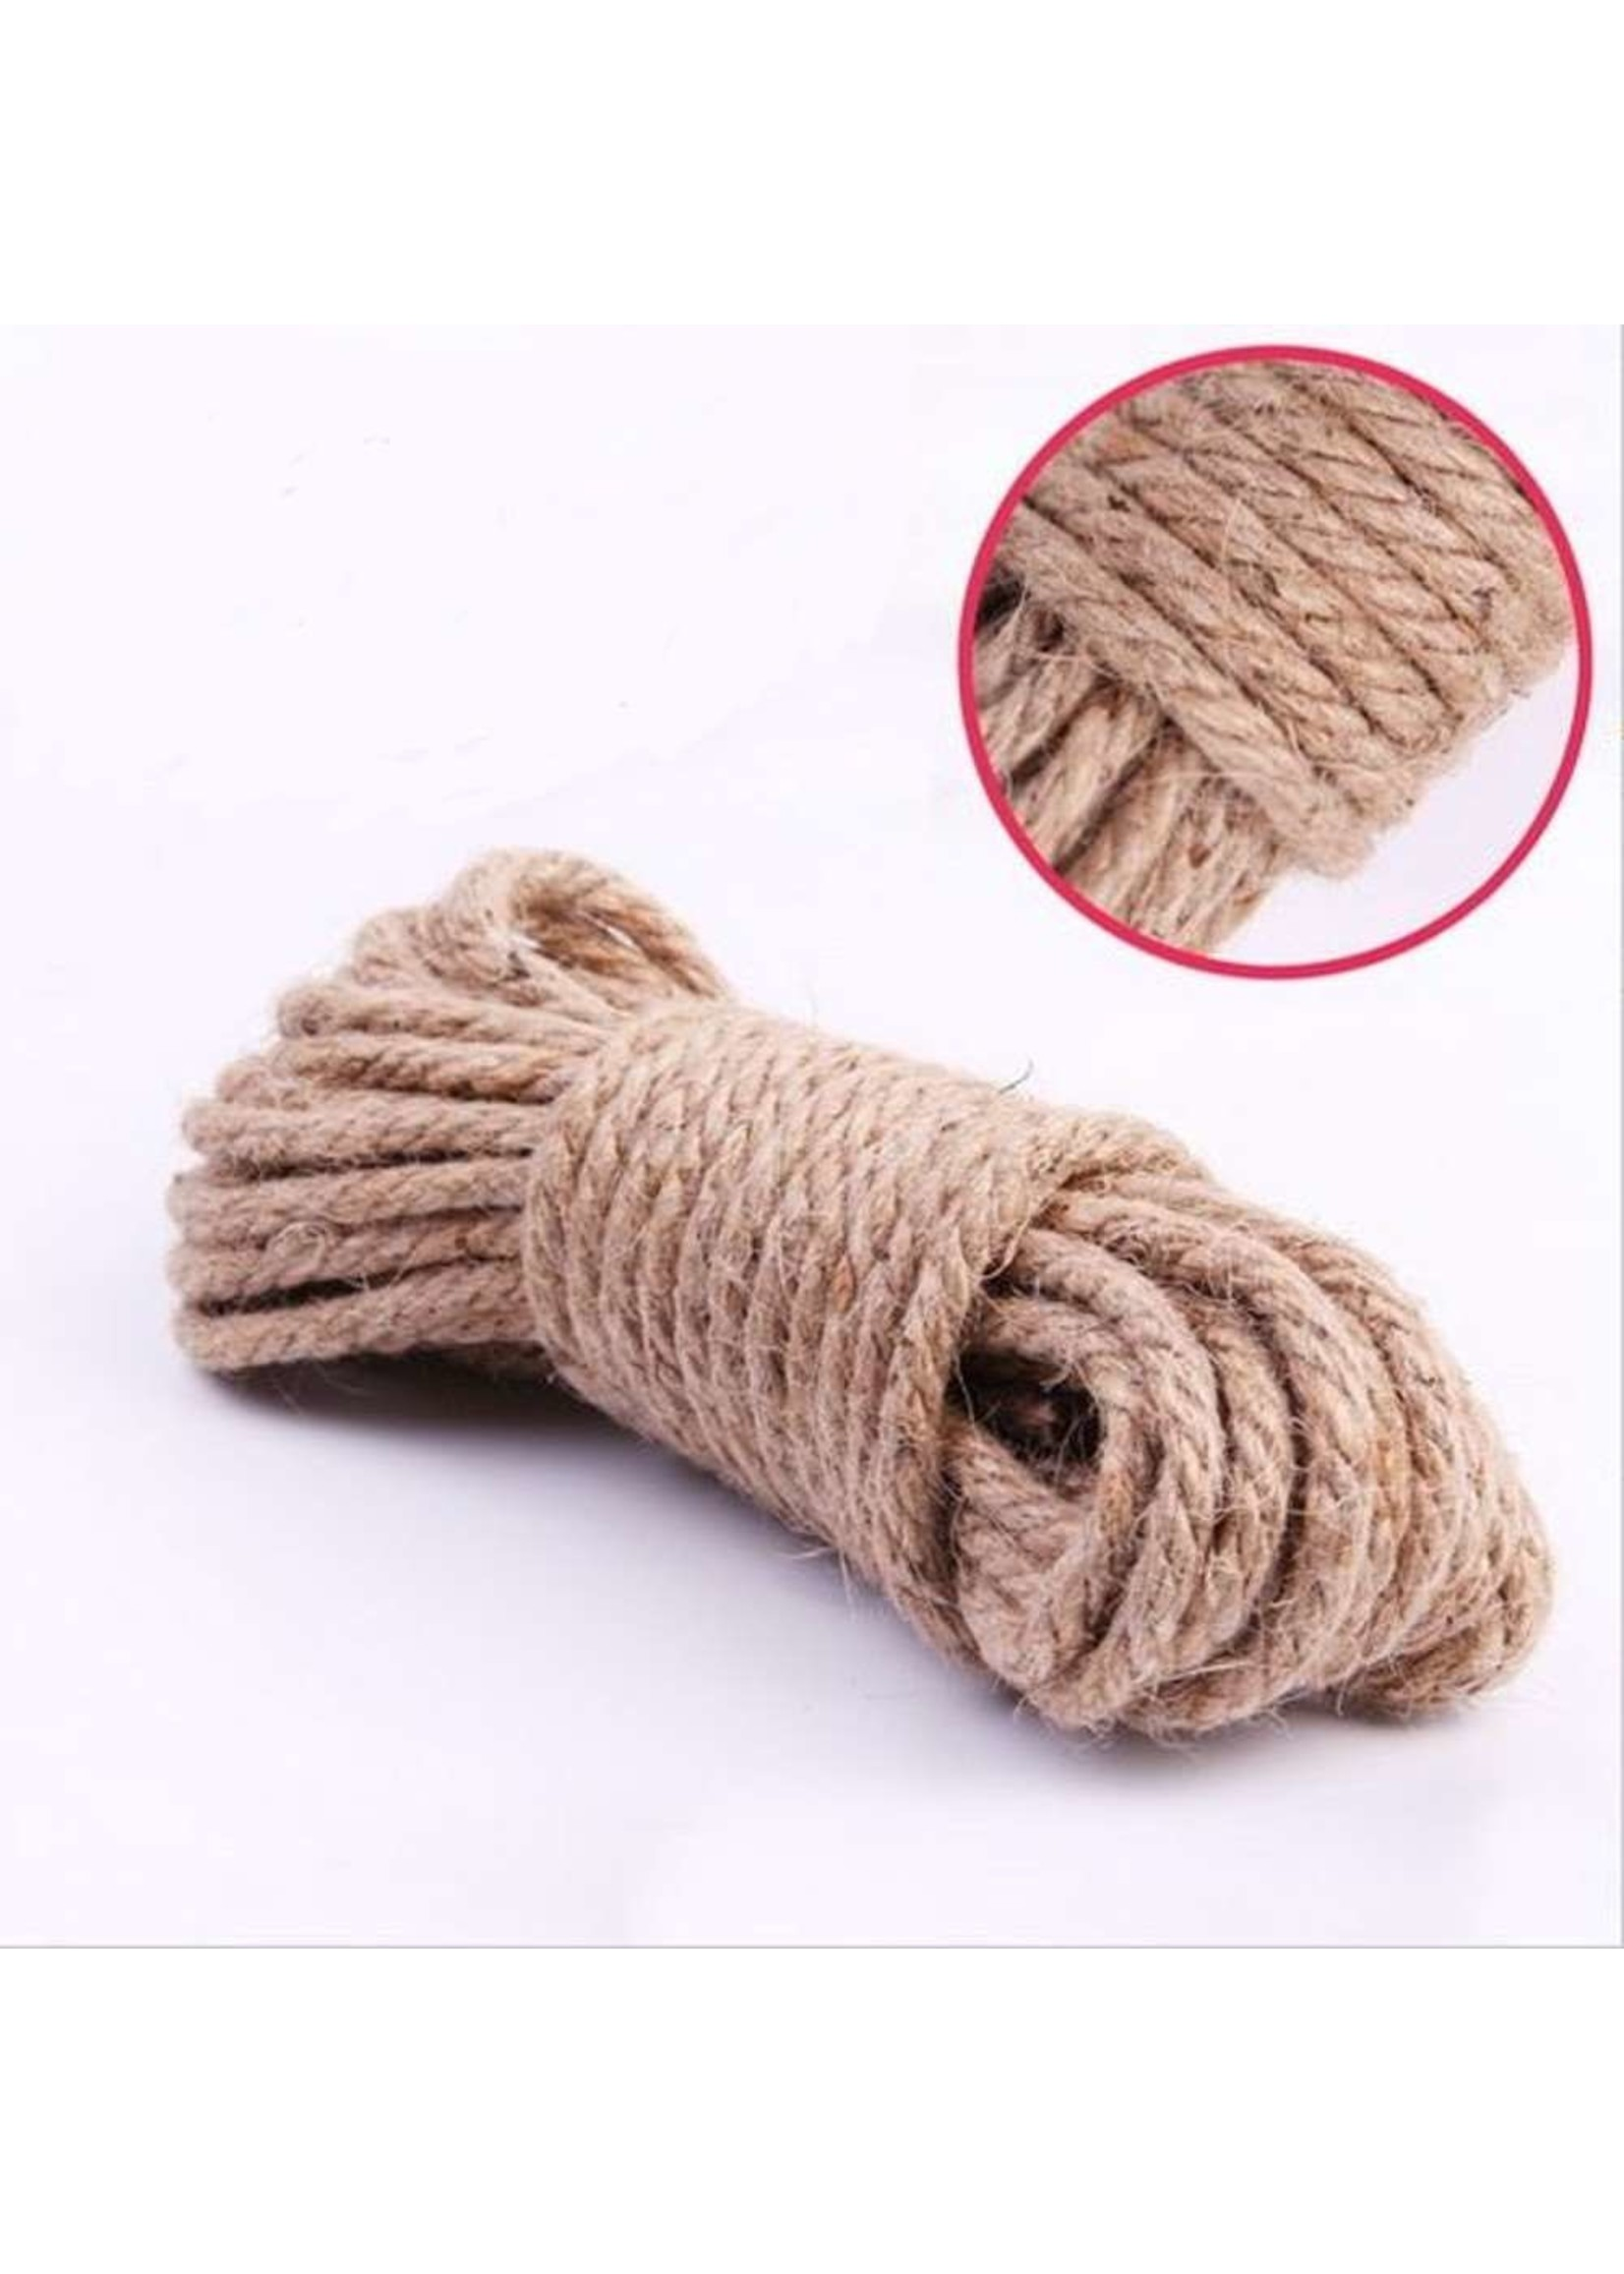 665 Leather 665 Natural Hemp Rope